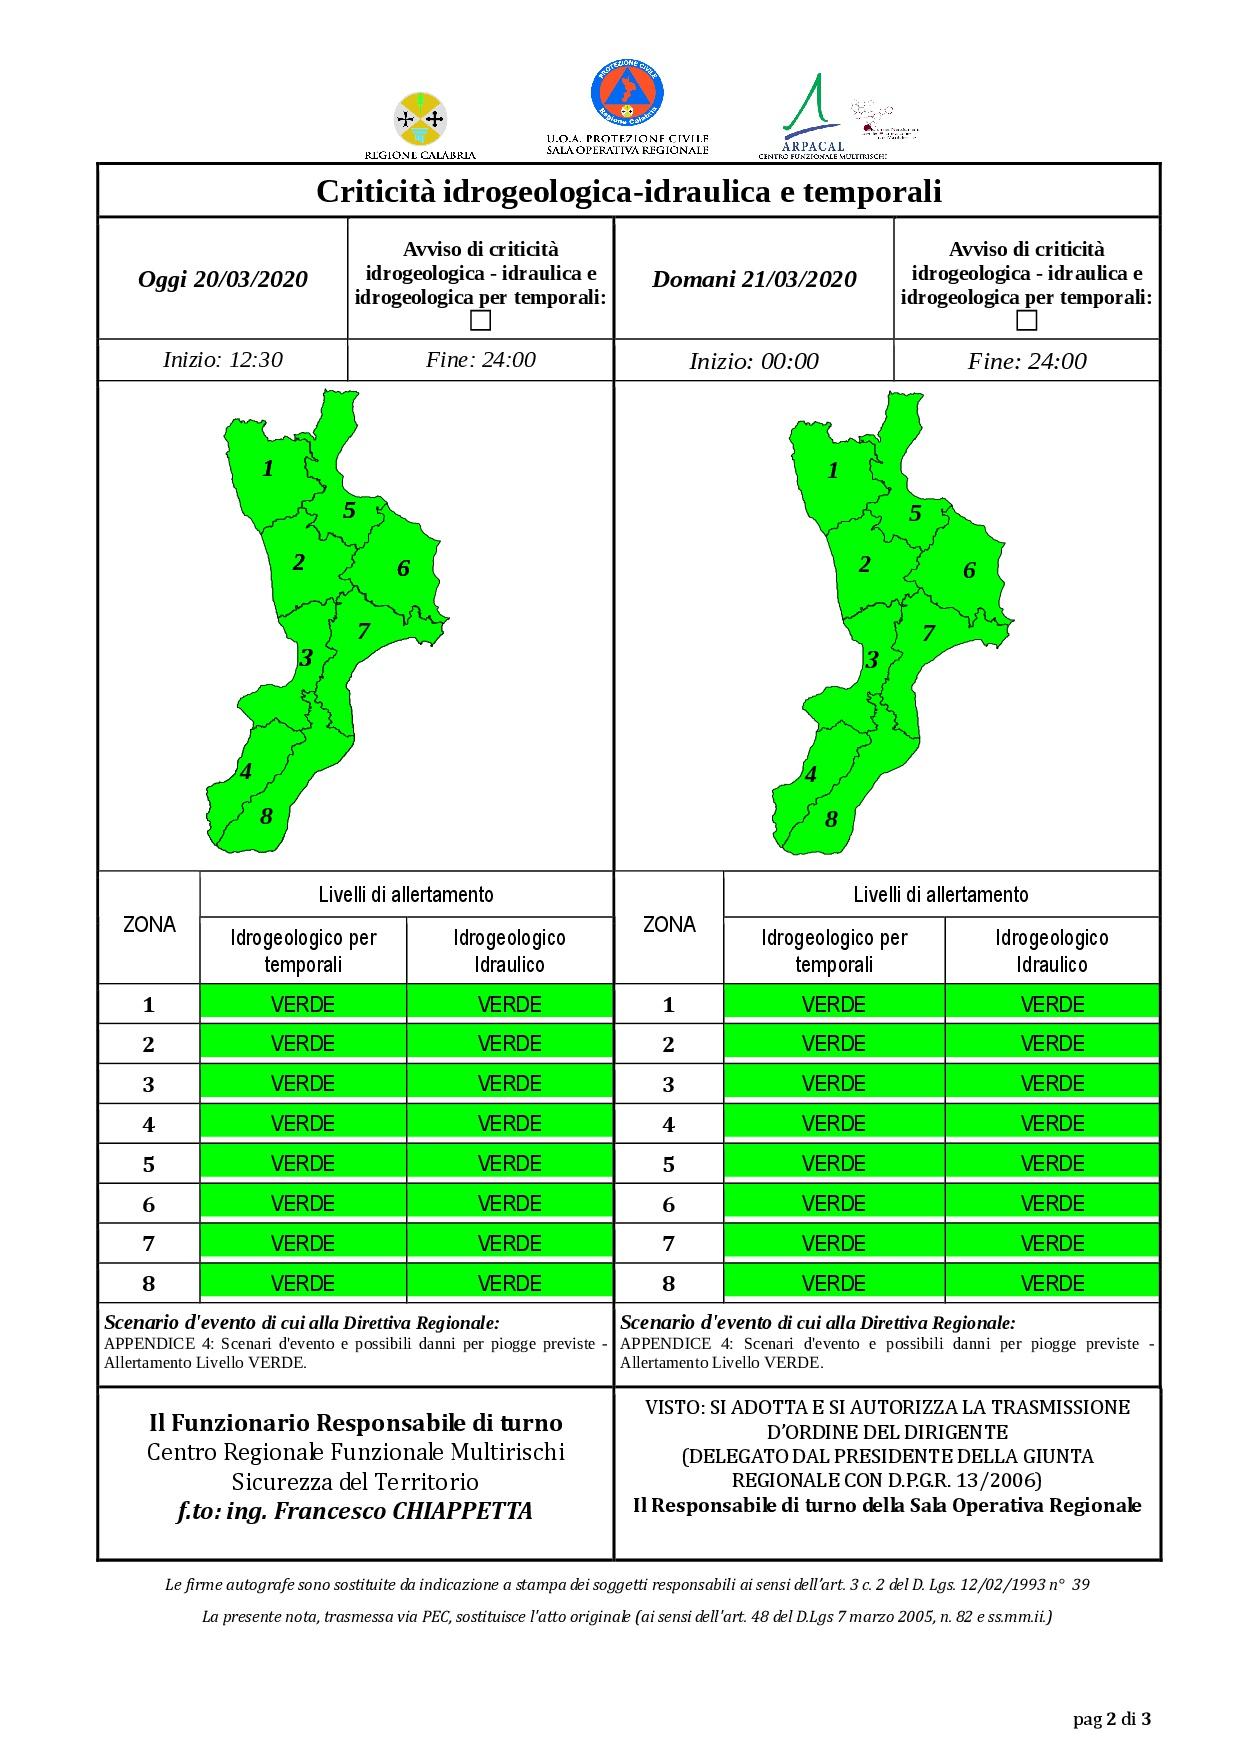 Criticità idrogeologica-idraulica e temporali in Calabria 20-03-2020